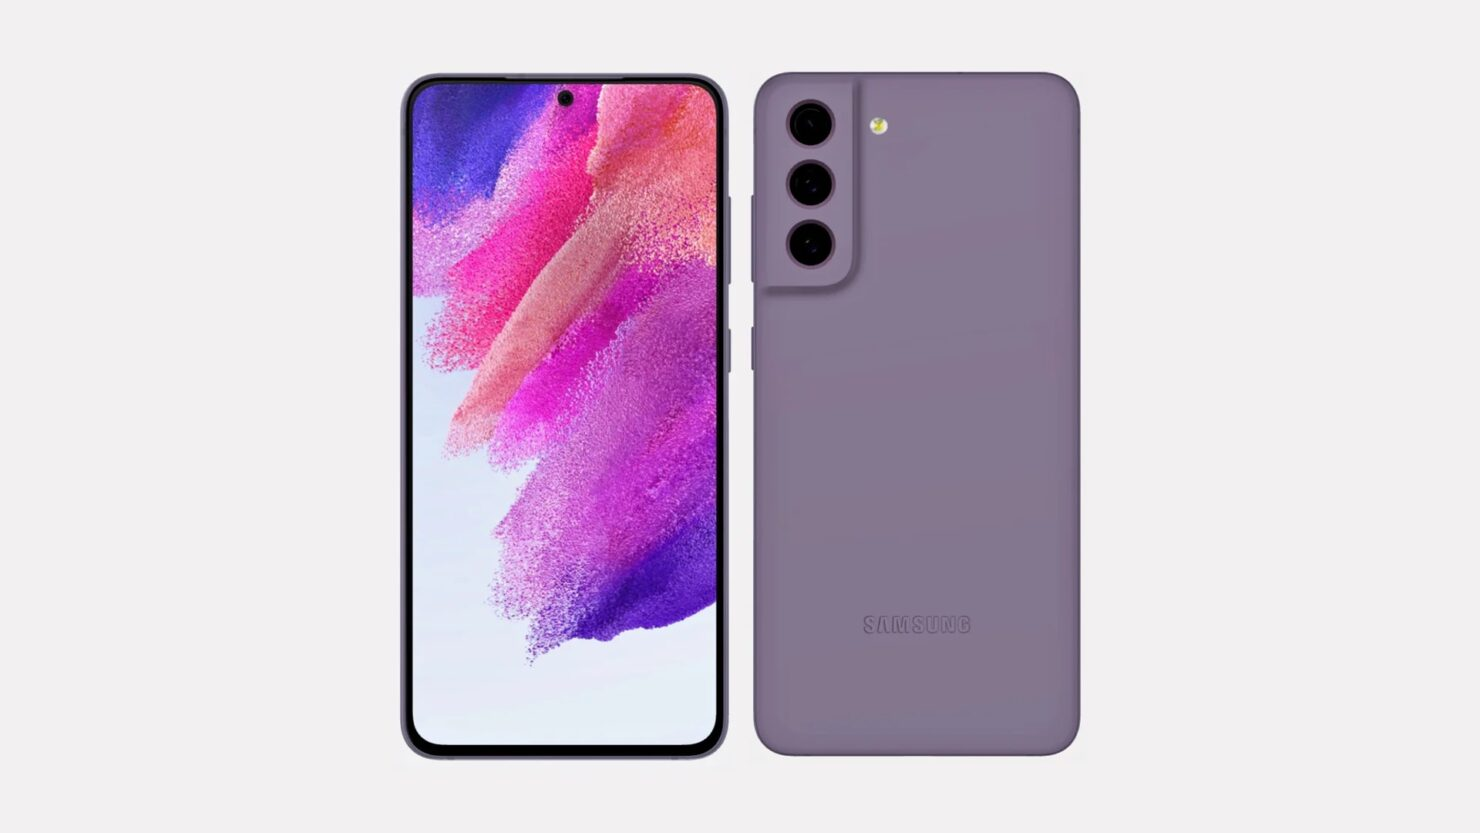 samsung-galaxy-s21-fe-lilac-purple